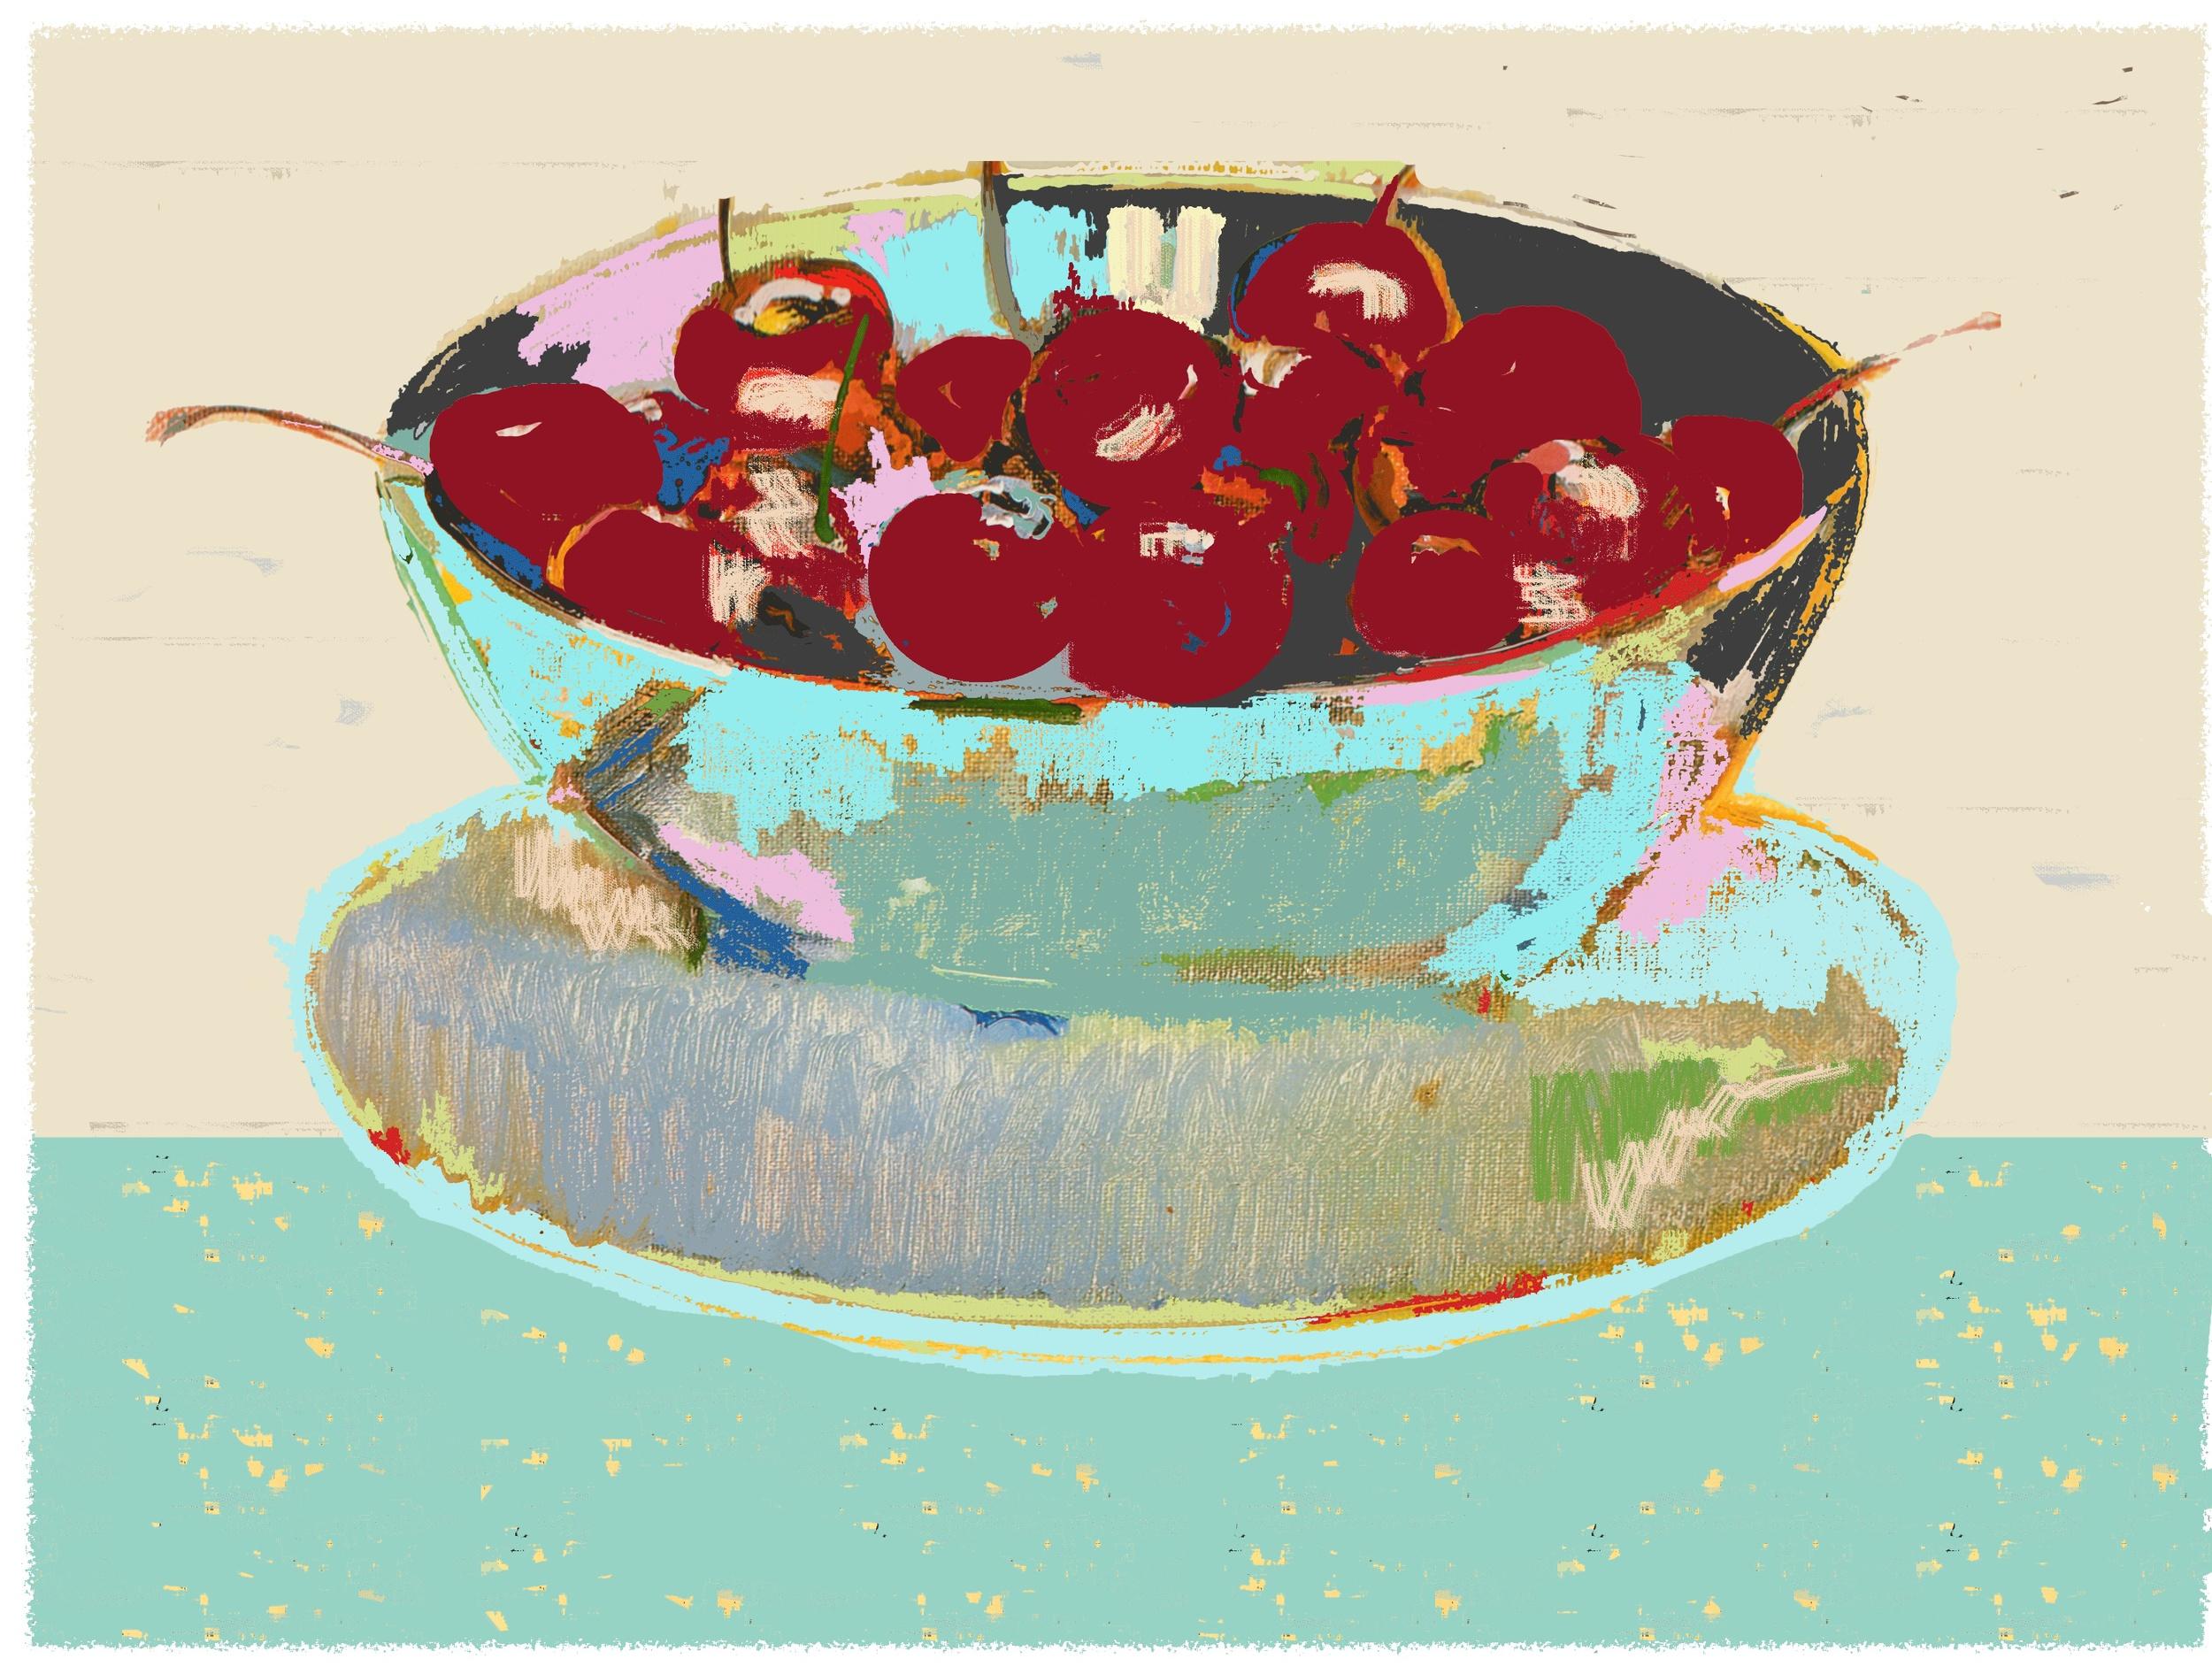 bowl-of-cherriesjpeg.jpg